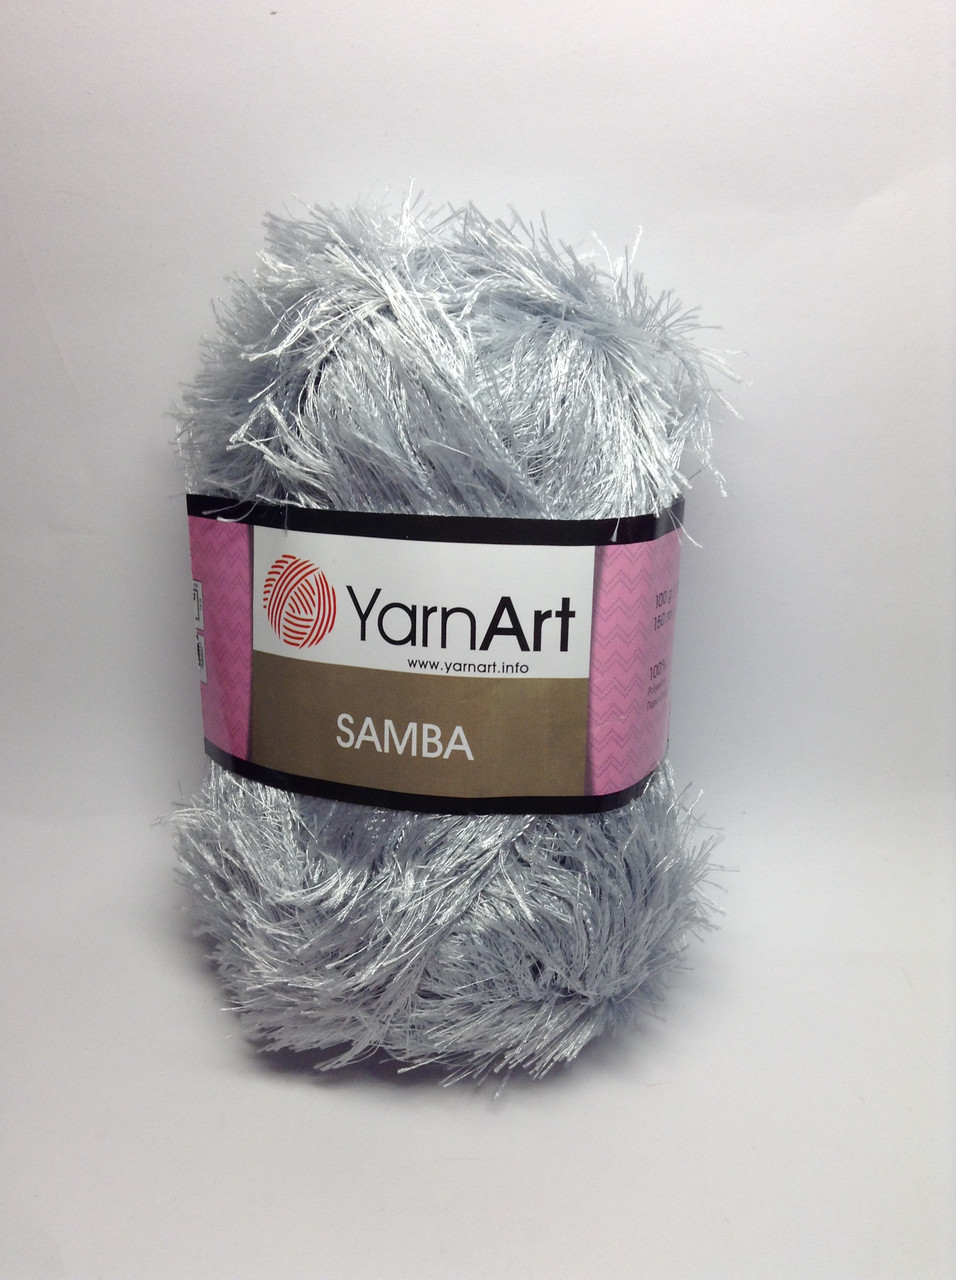 Пряжа samba YarnArt (травичка)